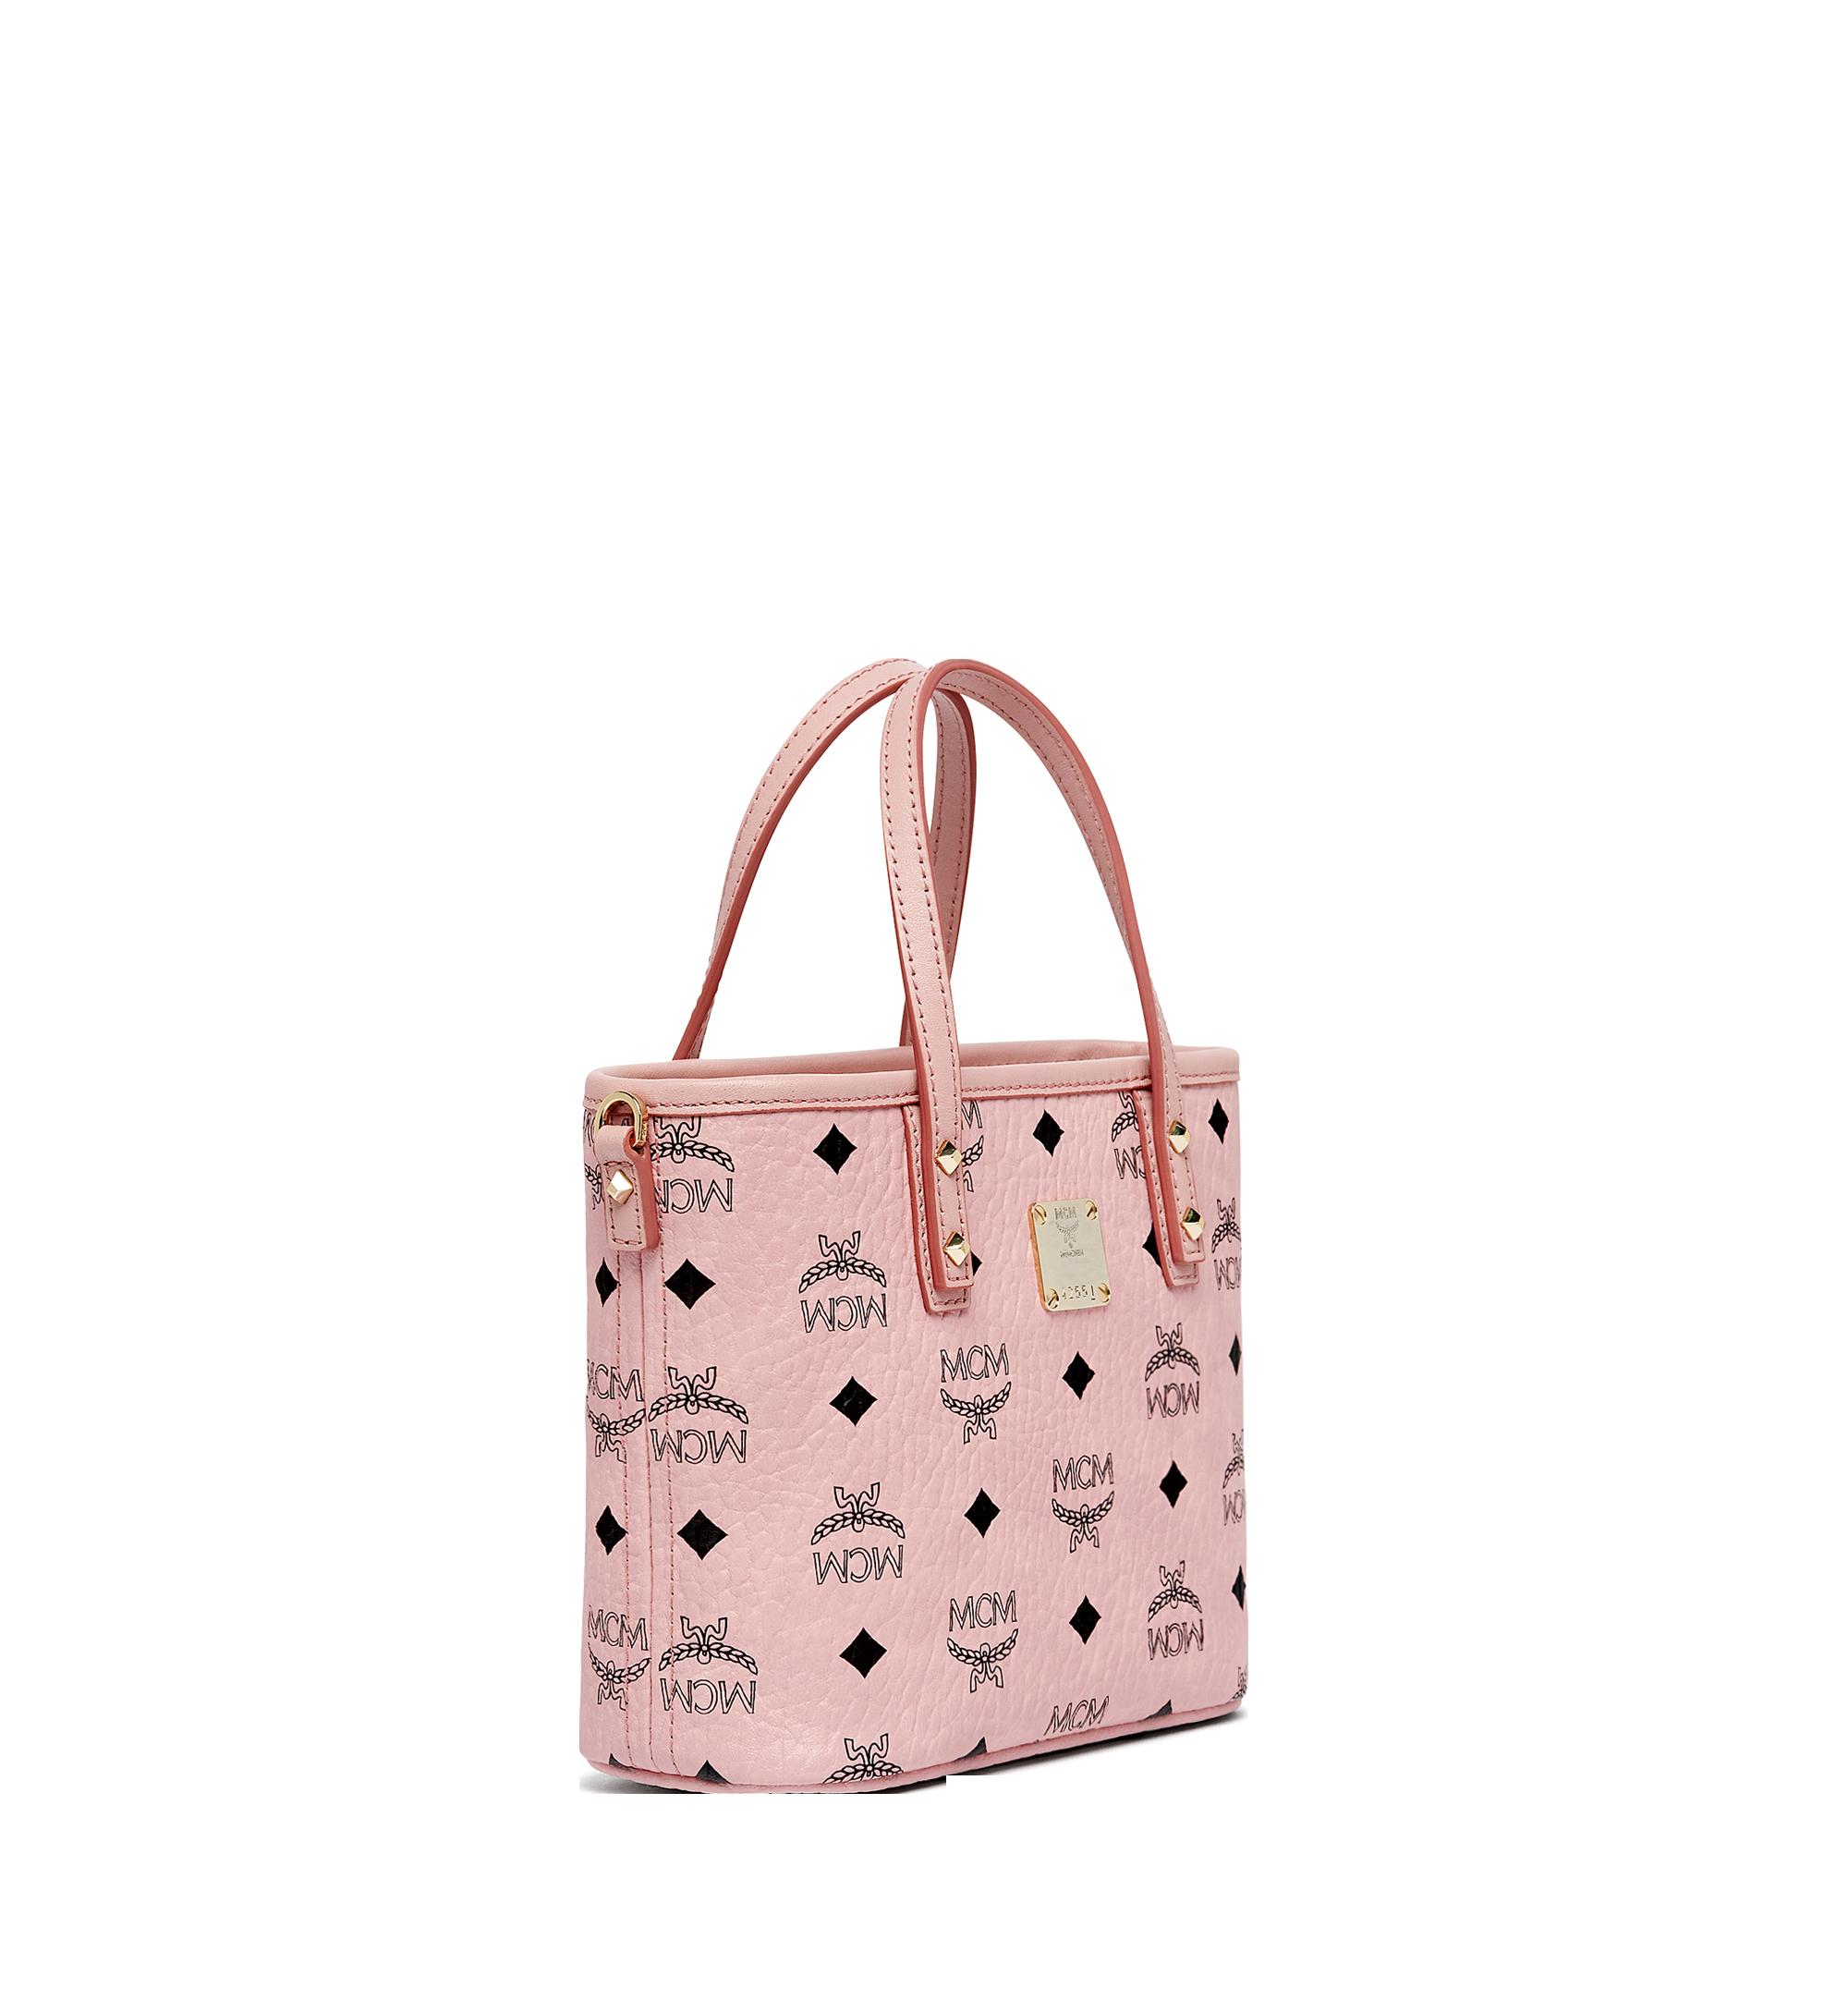 Mini Anya Shopper mit Reissverschluss in Visetos Rosa | MCM® DE